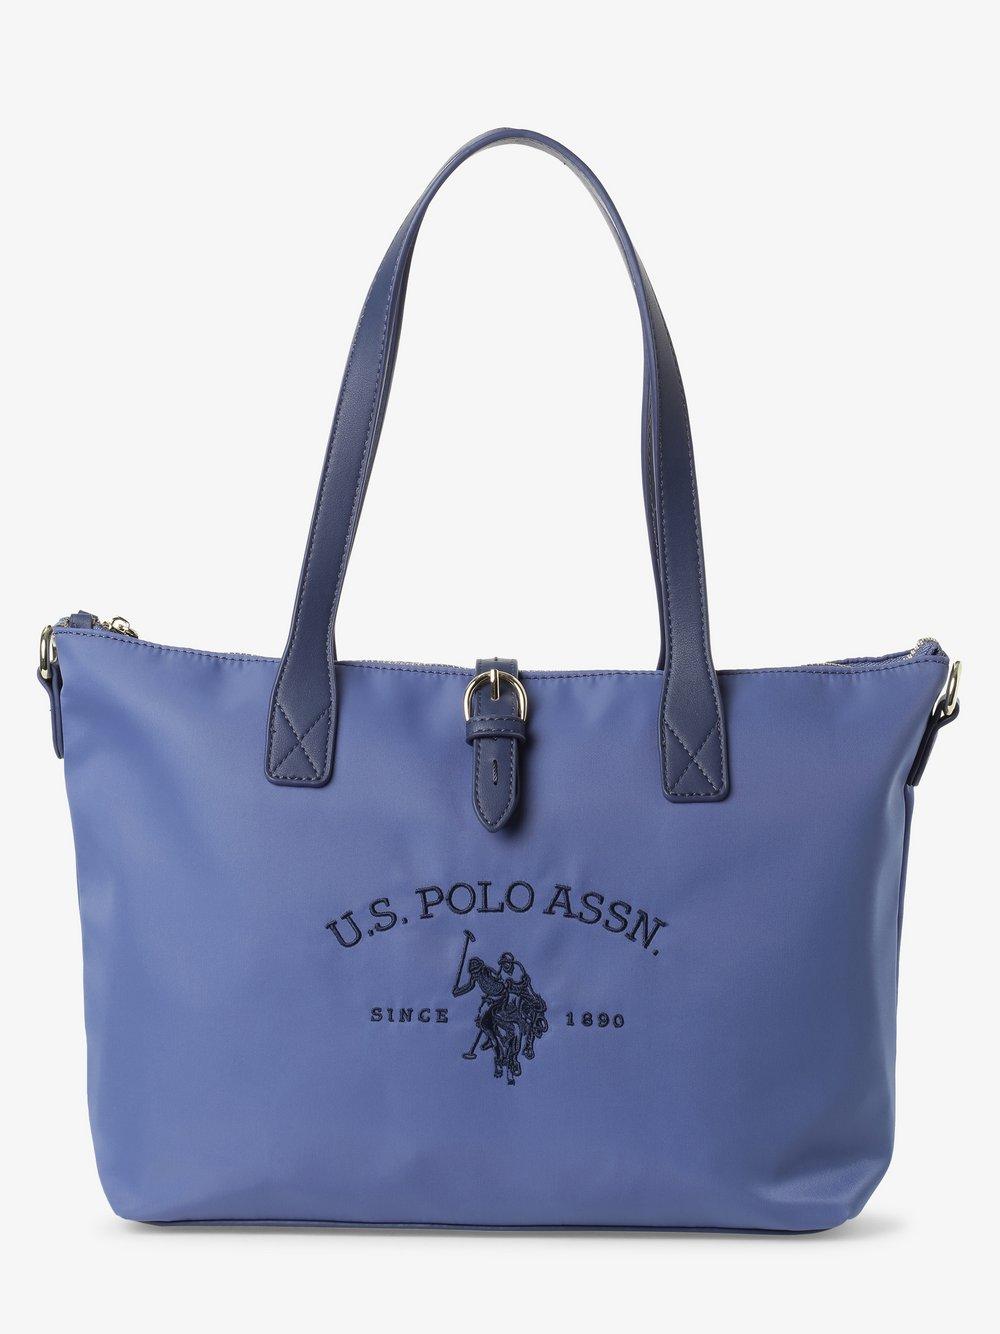 U.S. Polo Assn. – Damska torba shopper, niebieski Van Graaf 466425-0002